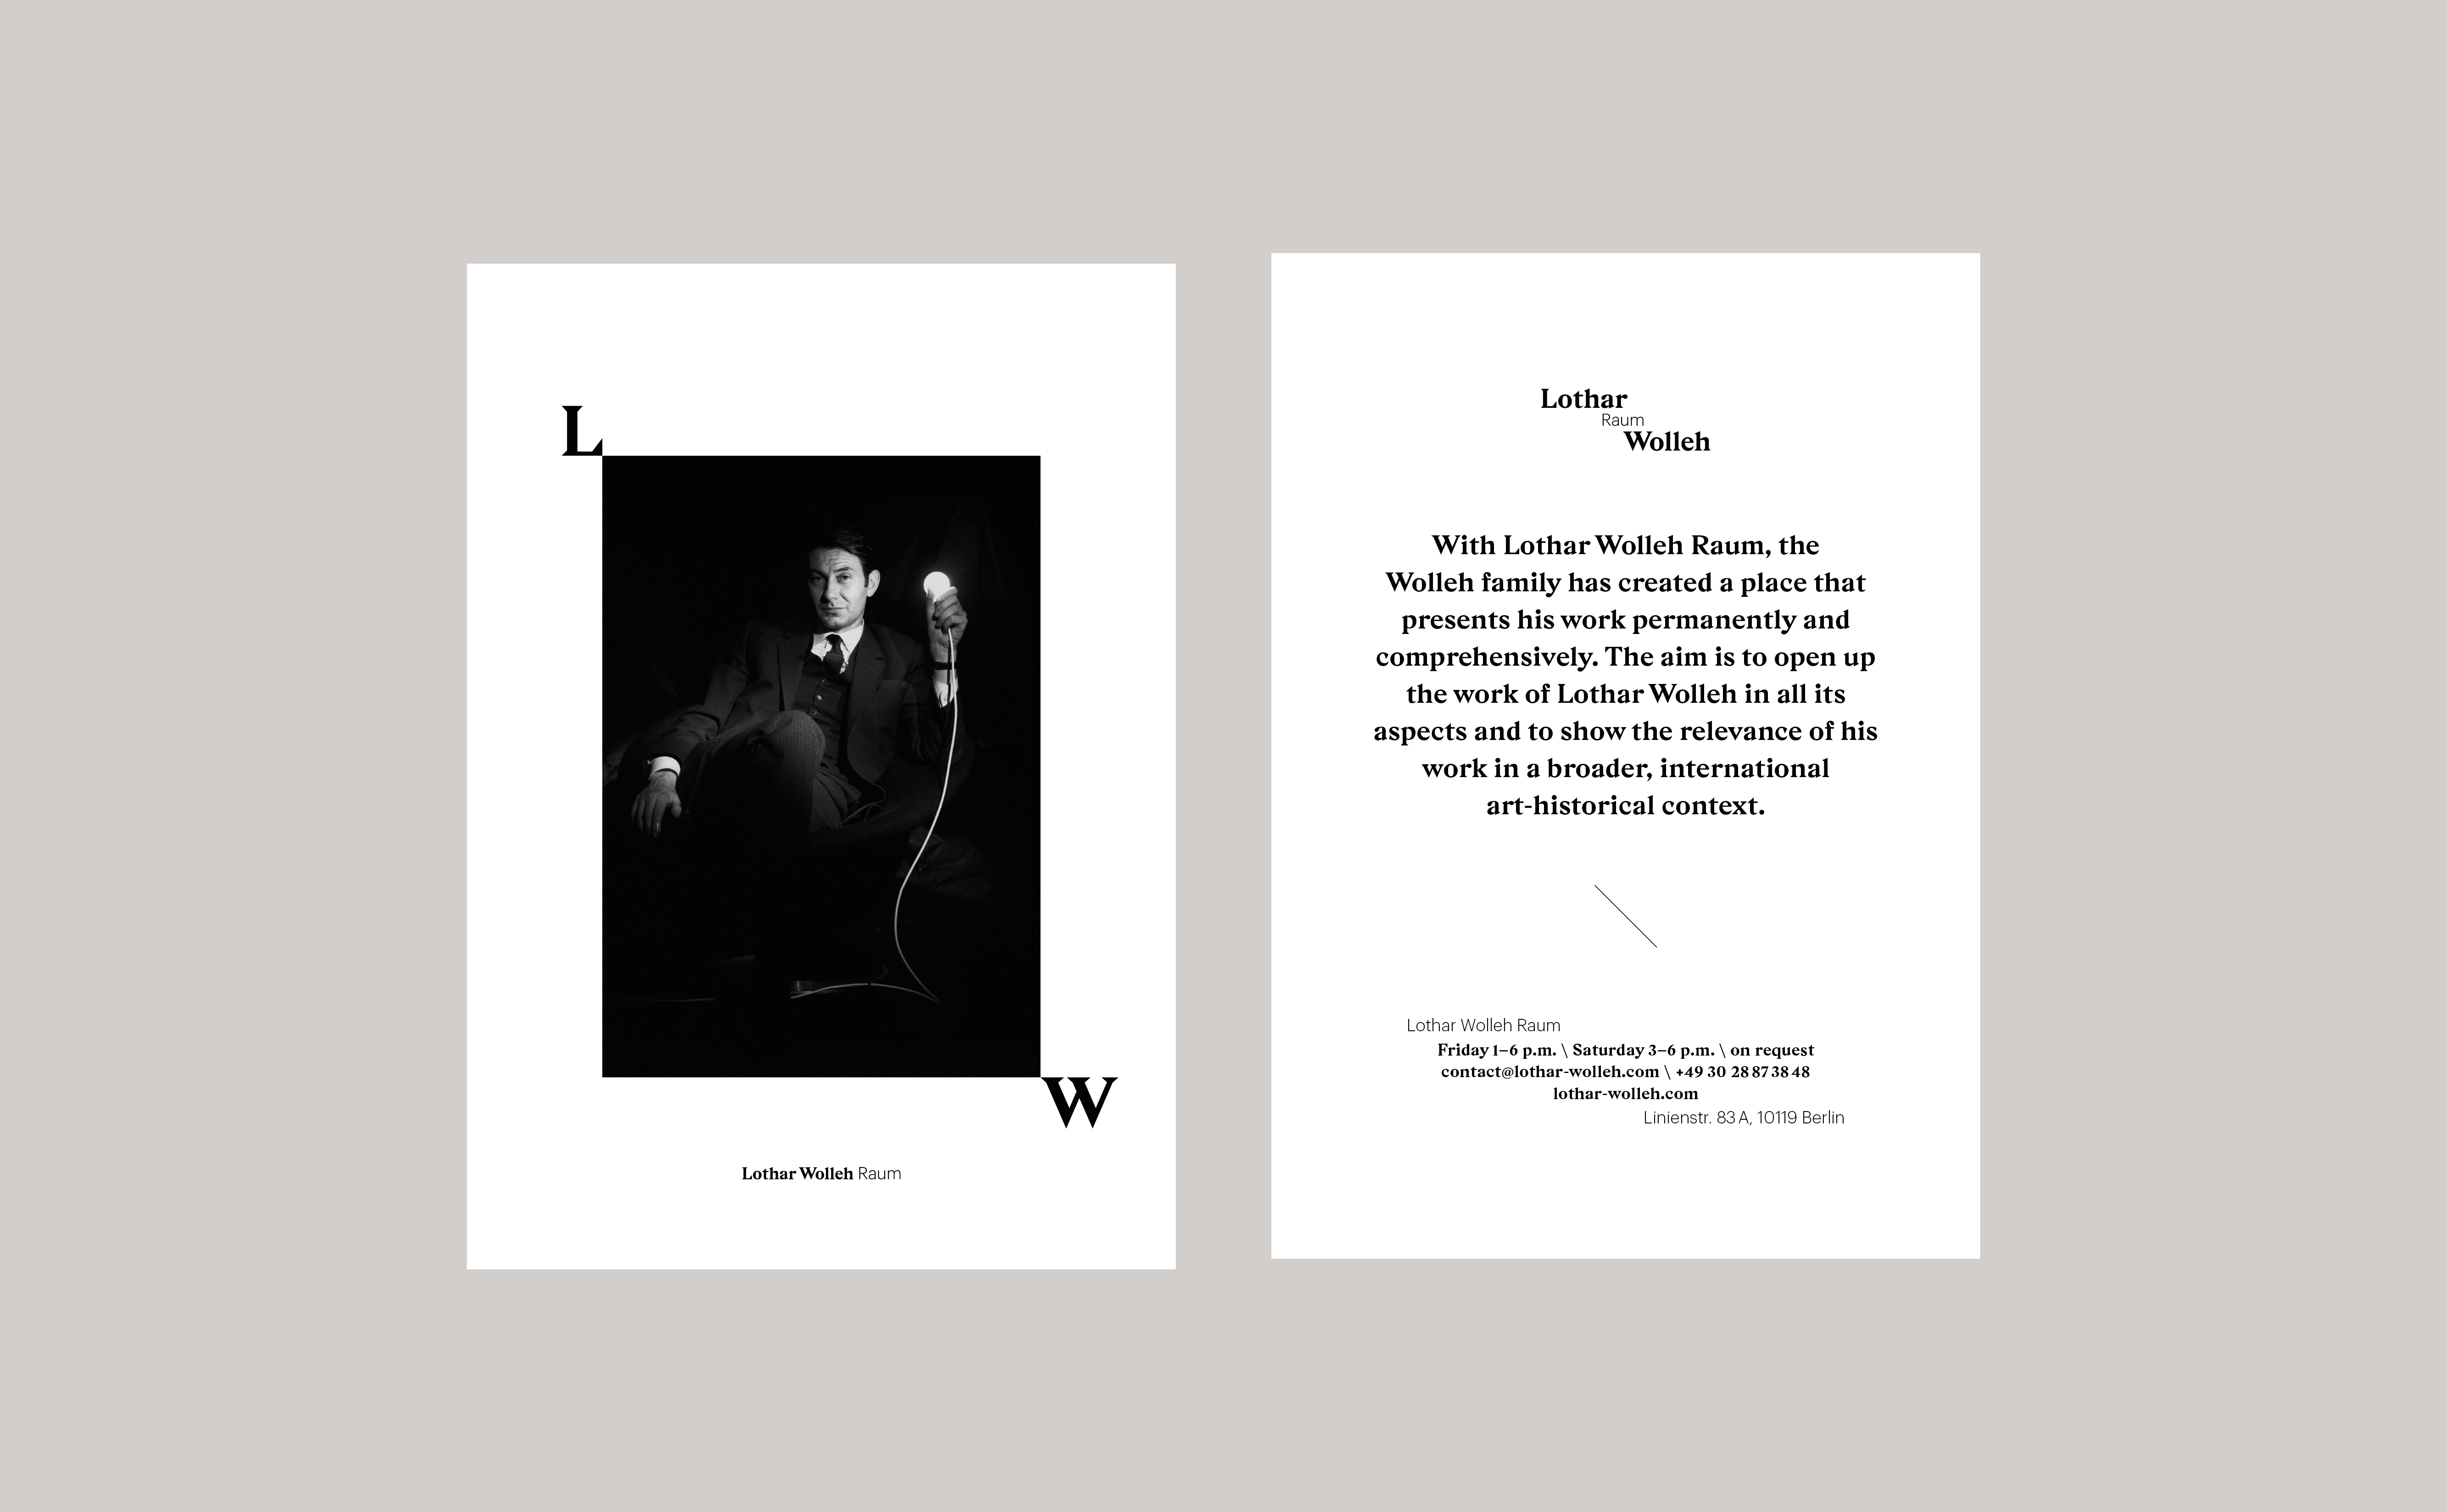 SHVI-Wolleh-infocard-02